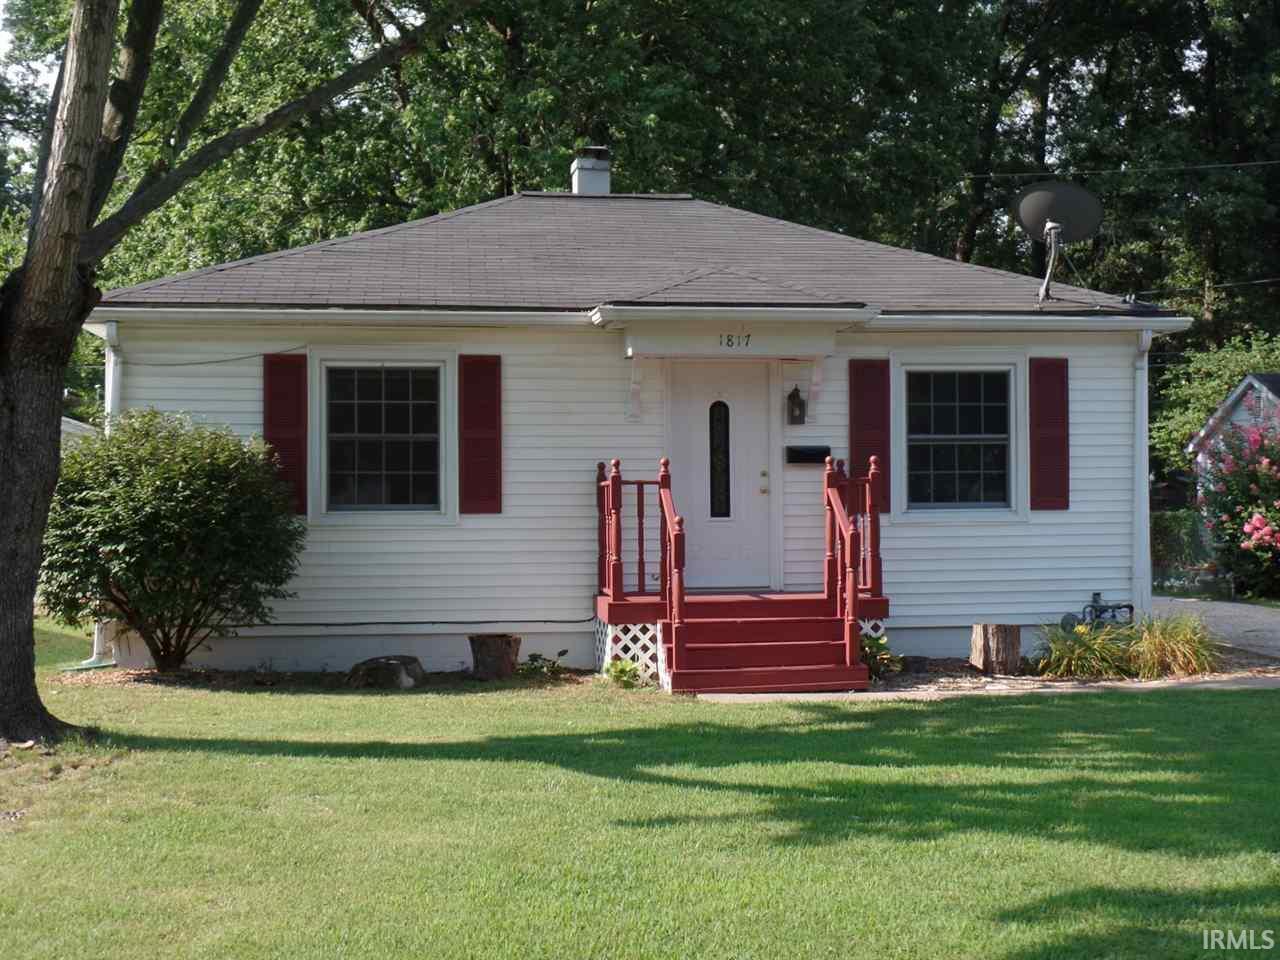 1817 Cass Ave, Evansville, IN 47714